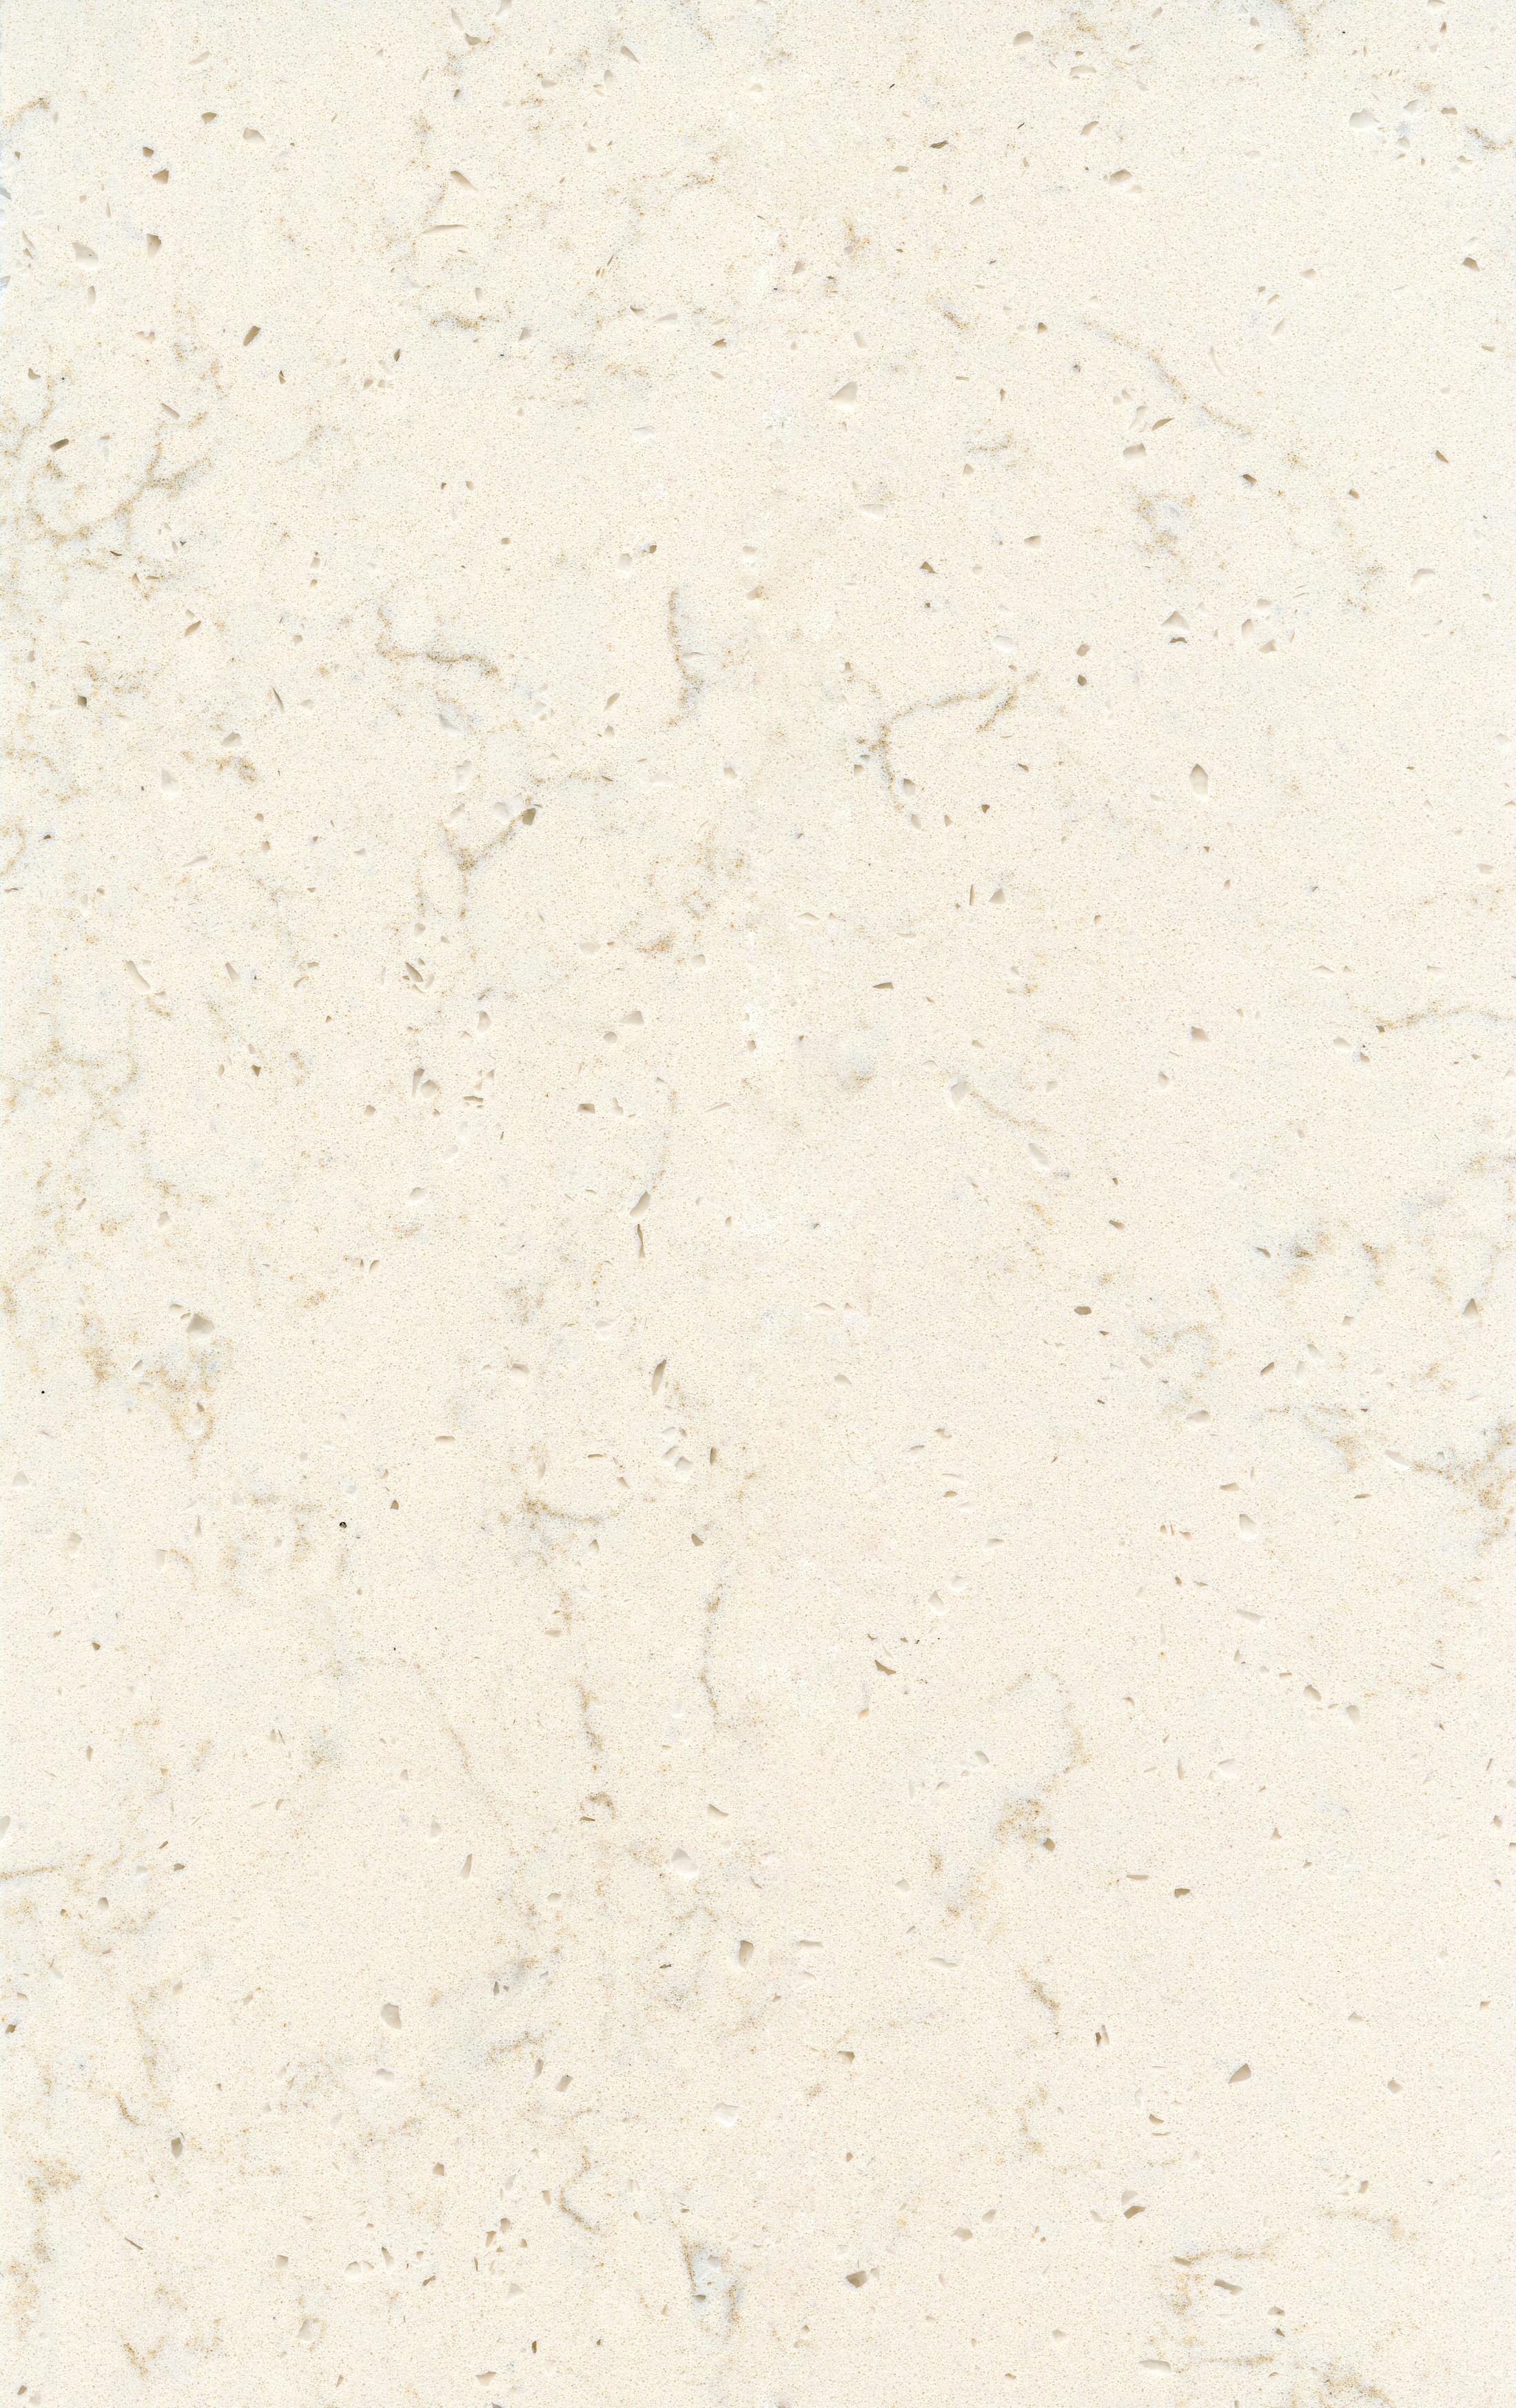 Cosentino Usa Silestone Introduces New Stonium Color